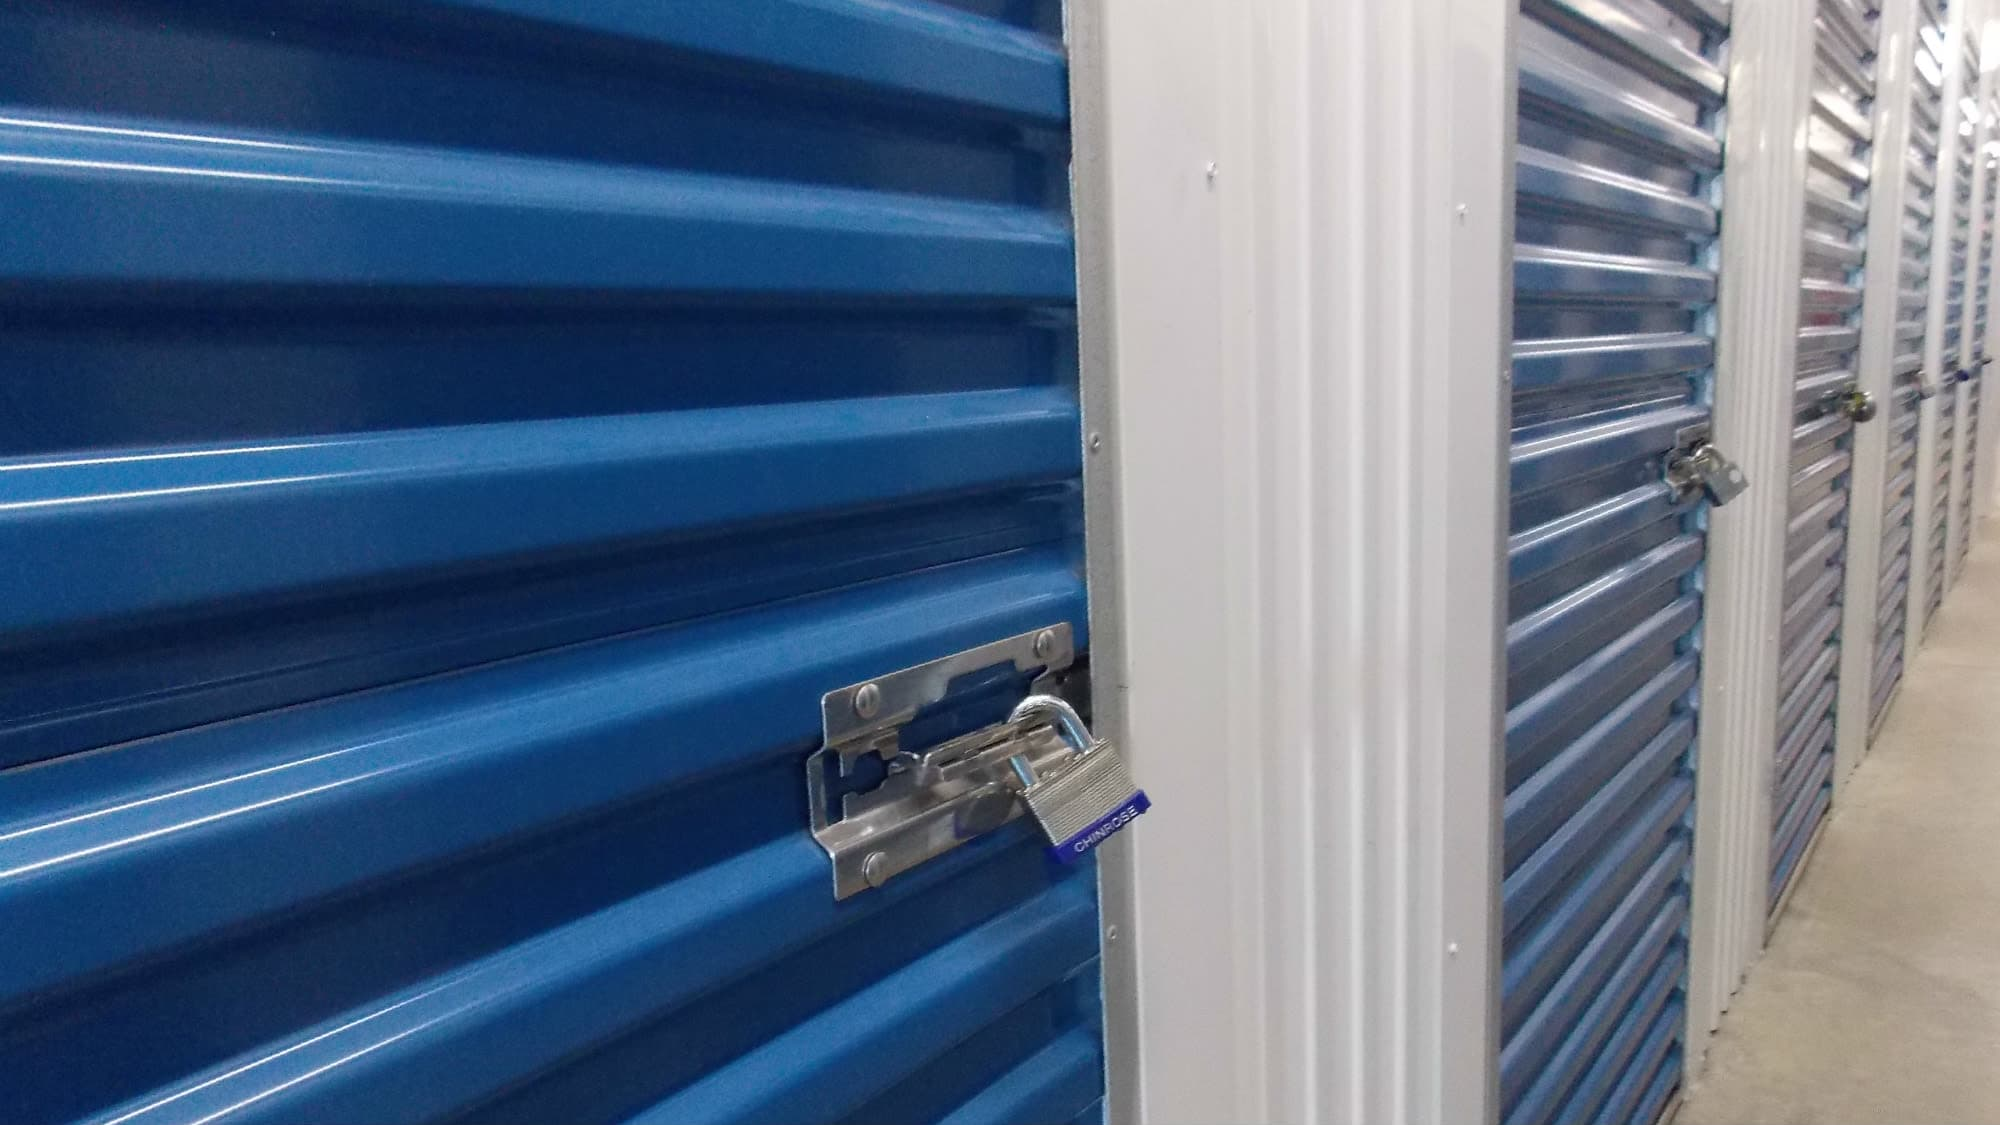 Locked unit at Freestate Self Storage in Laurel, Maryland